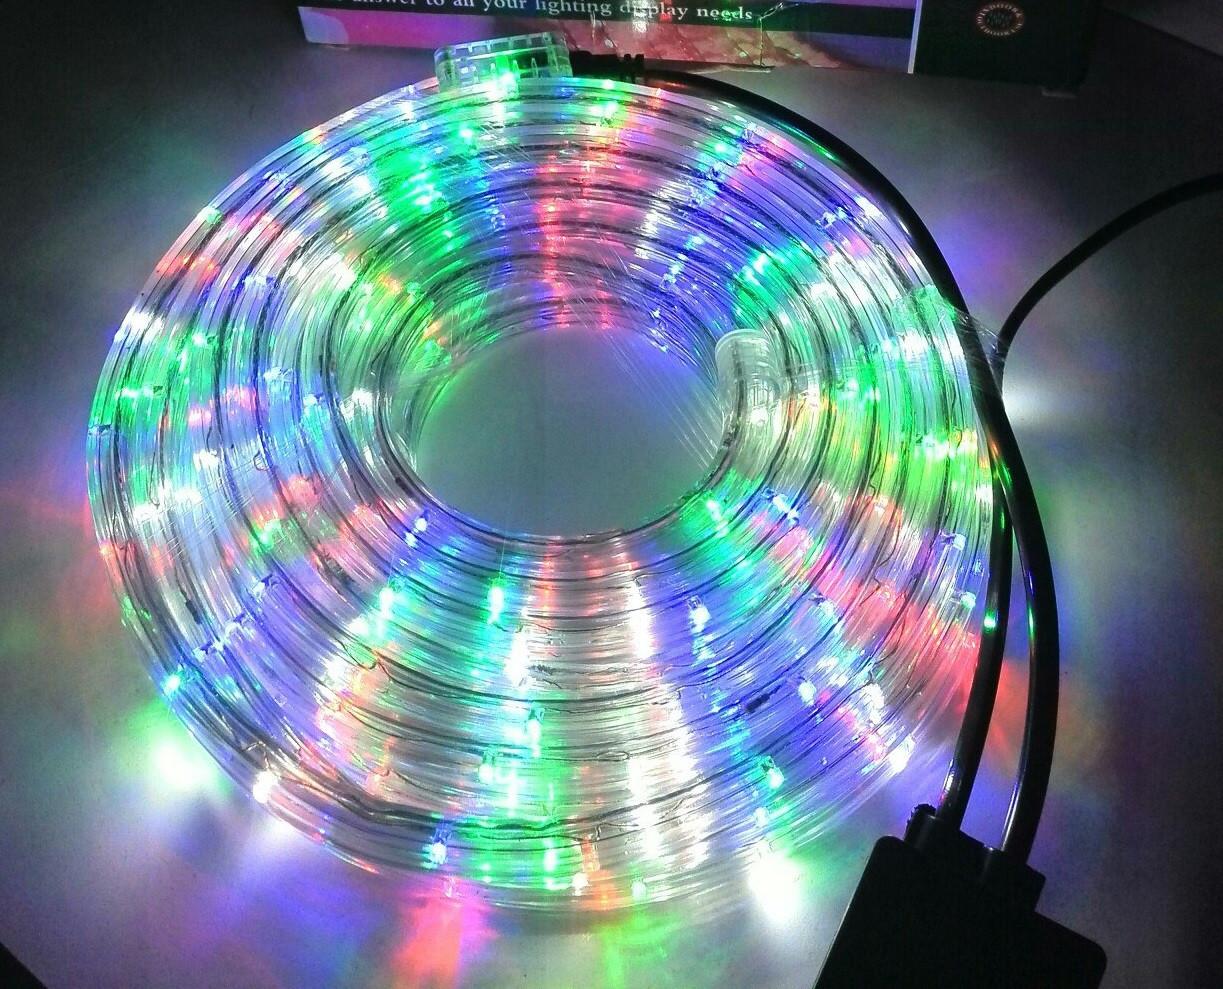 Гирлянда уличная лента светодиодная (LED) 10 м